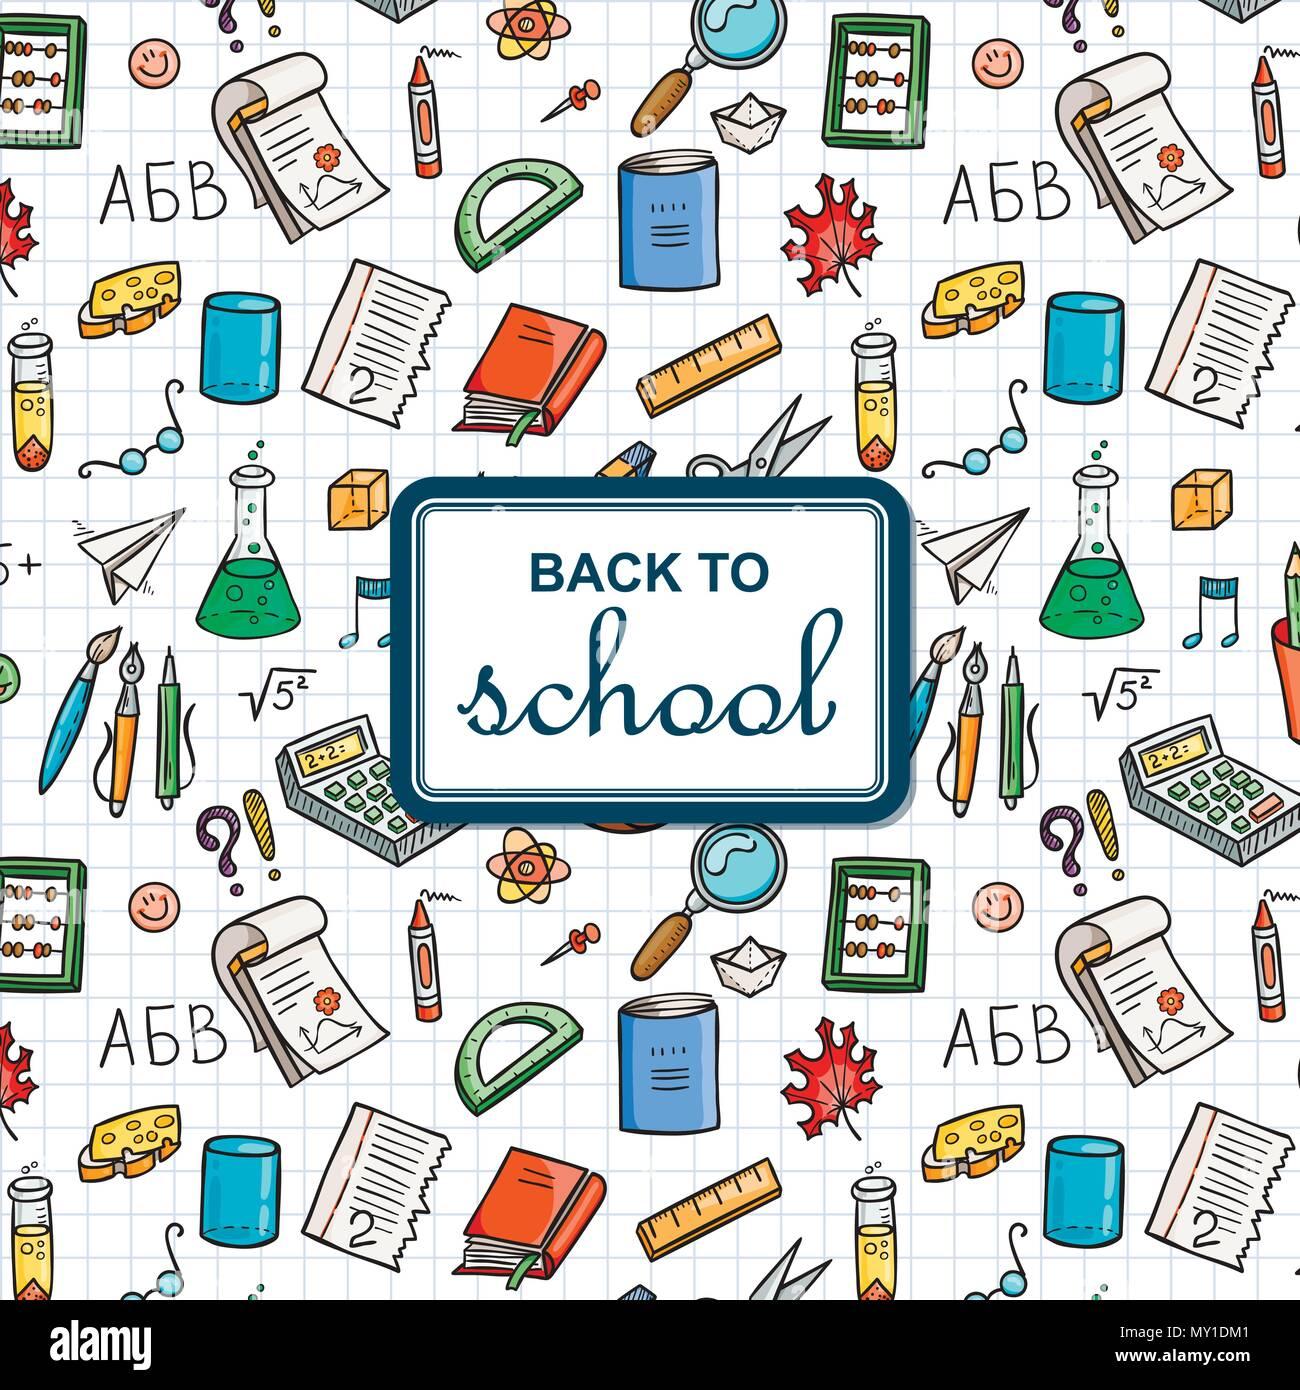 Illustration School Supplies Doodles Stock Photos